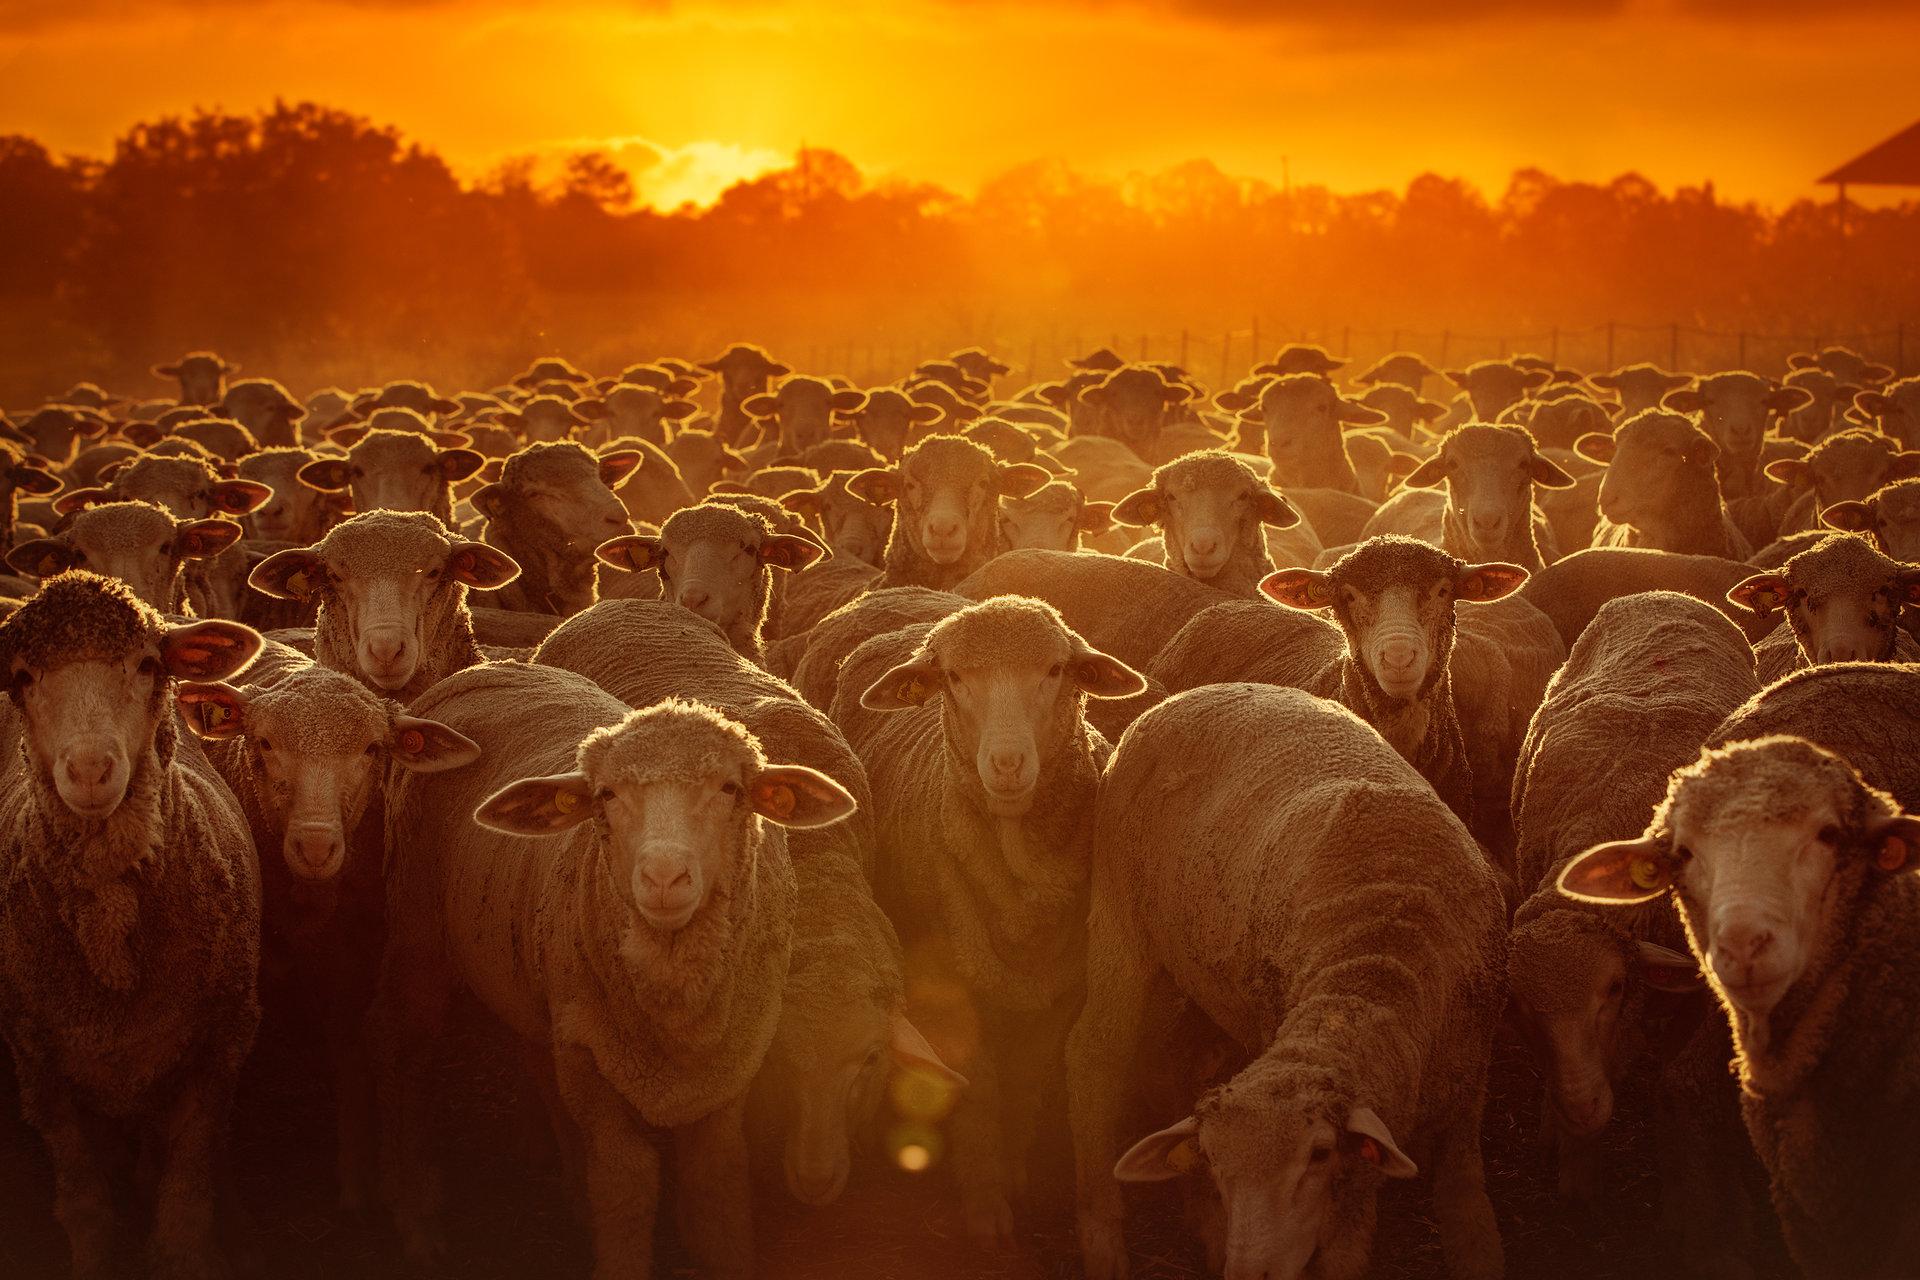 Залез над фермата | Author Vladimir Karamazov - Vlado79 | PHOTO FORUM